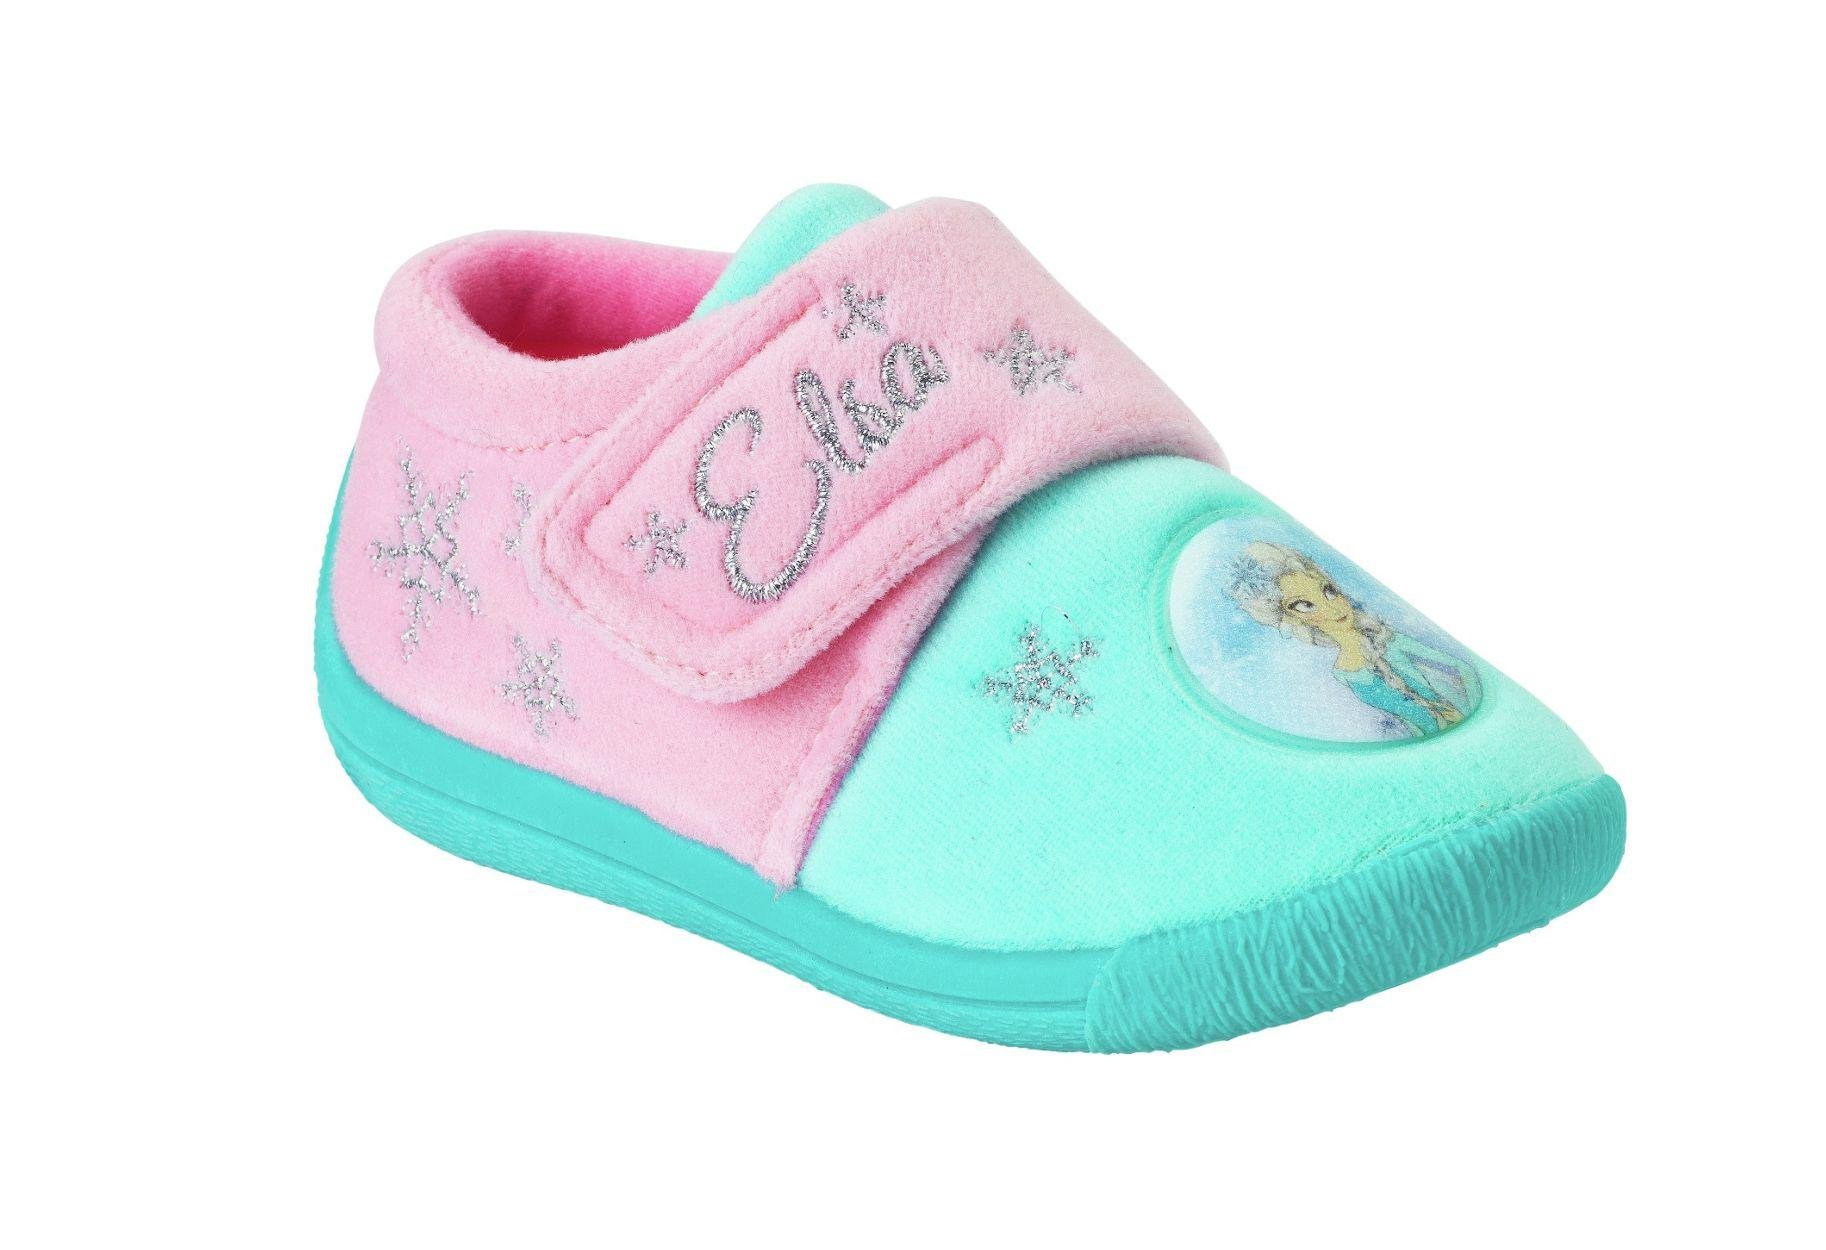 Image of Disney Frozen Slippers - Size 7